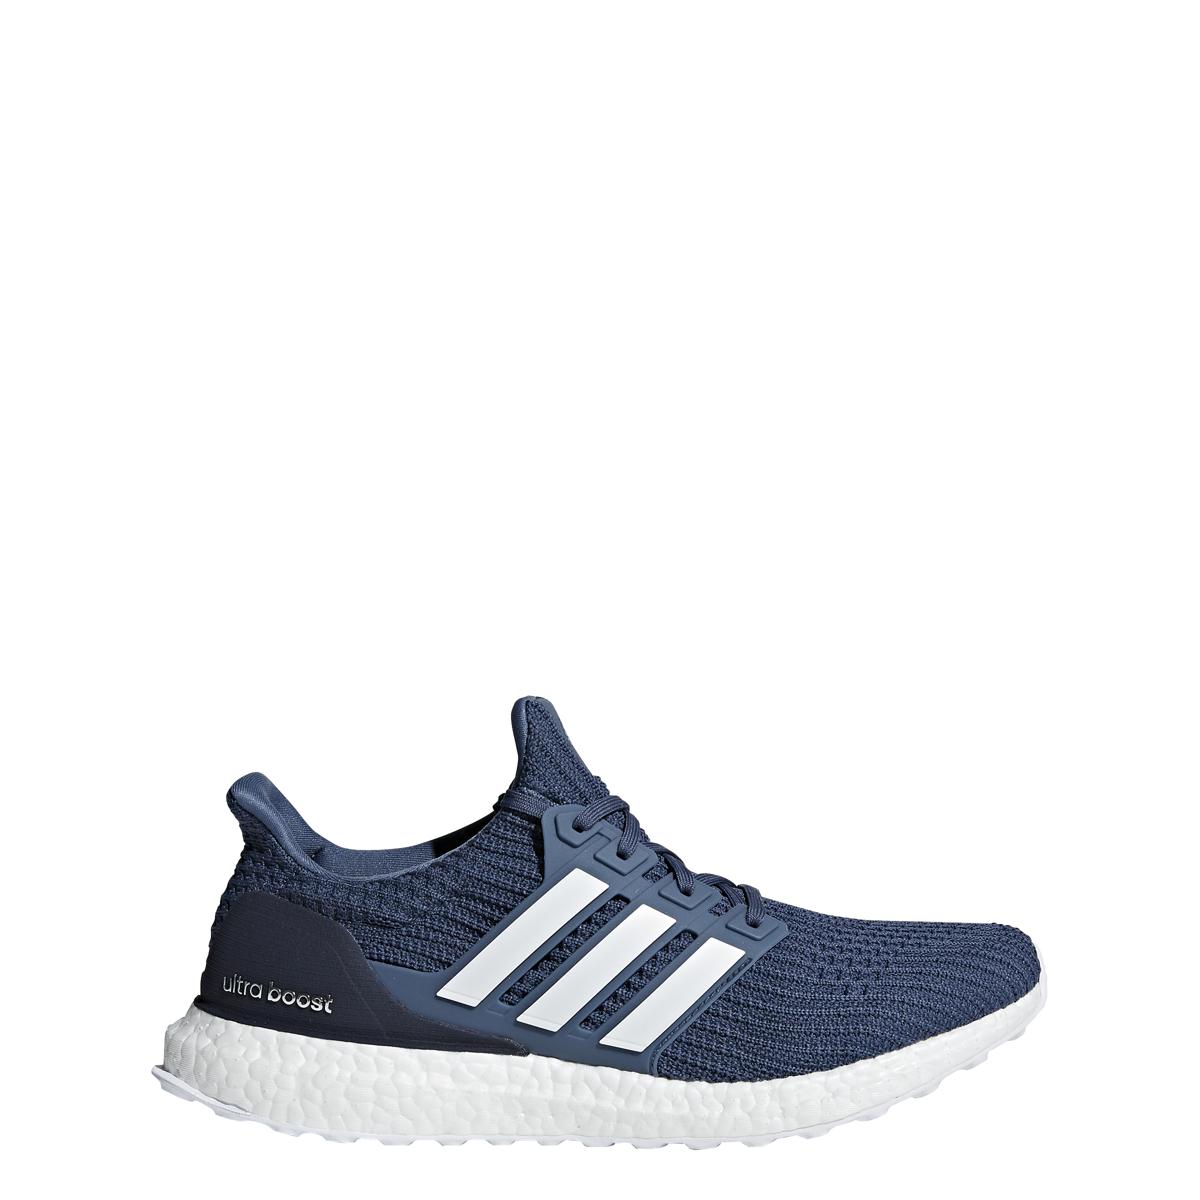 9b1bc76c8ffa6 Men s Adidas UltraBOOST Running Shoe Tech Ink Cloud White Vapor Grey ...